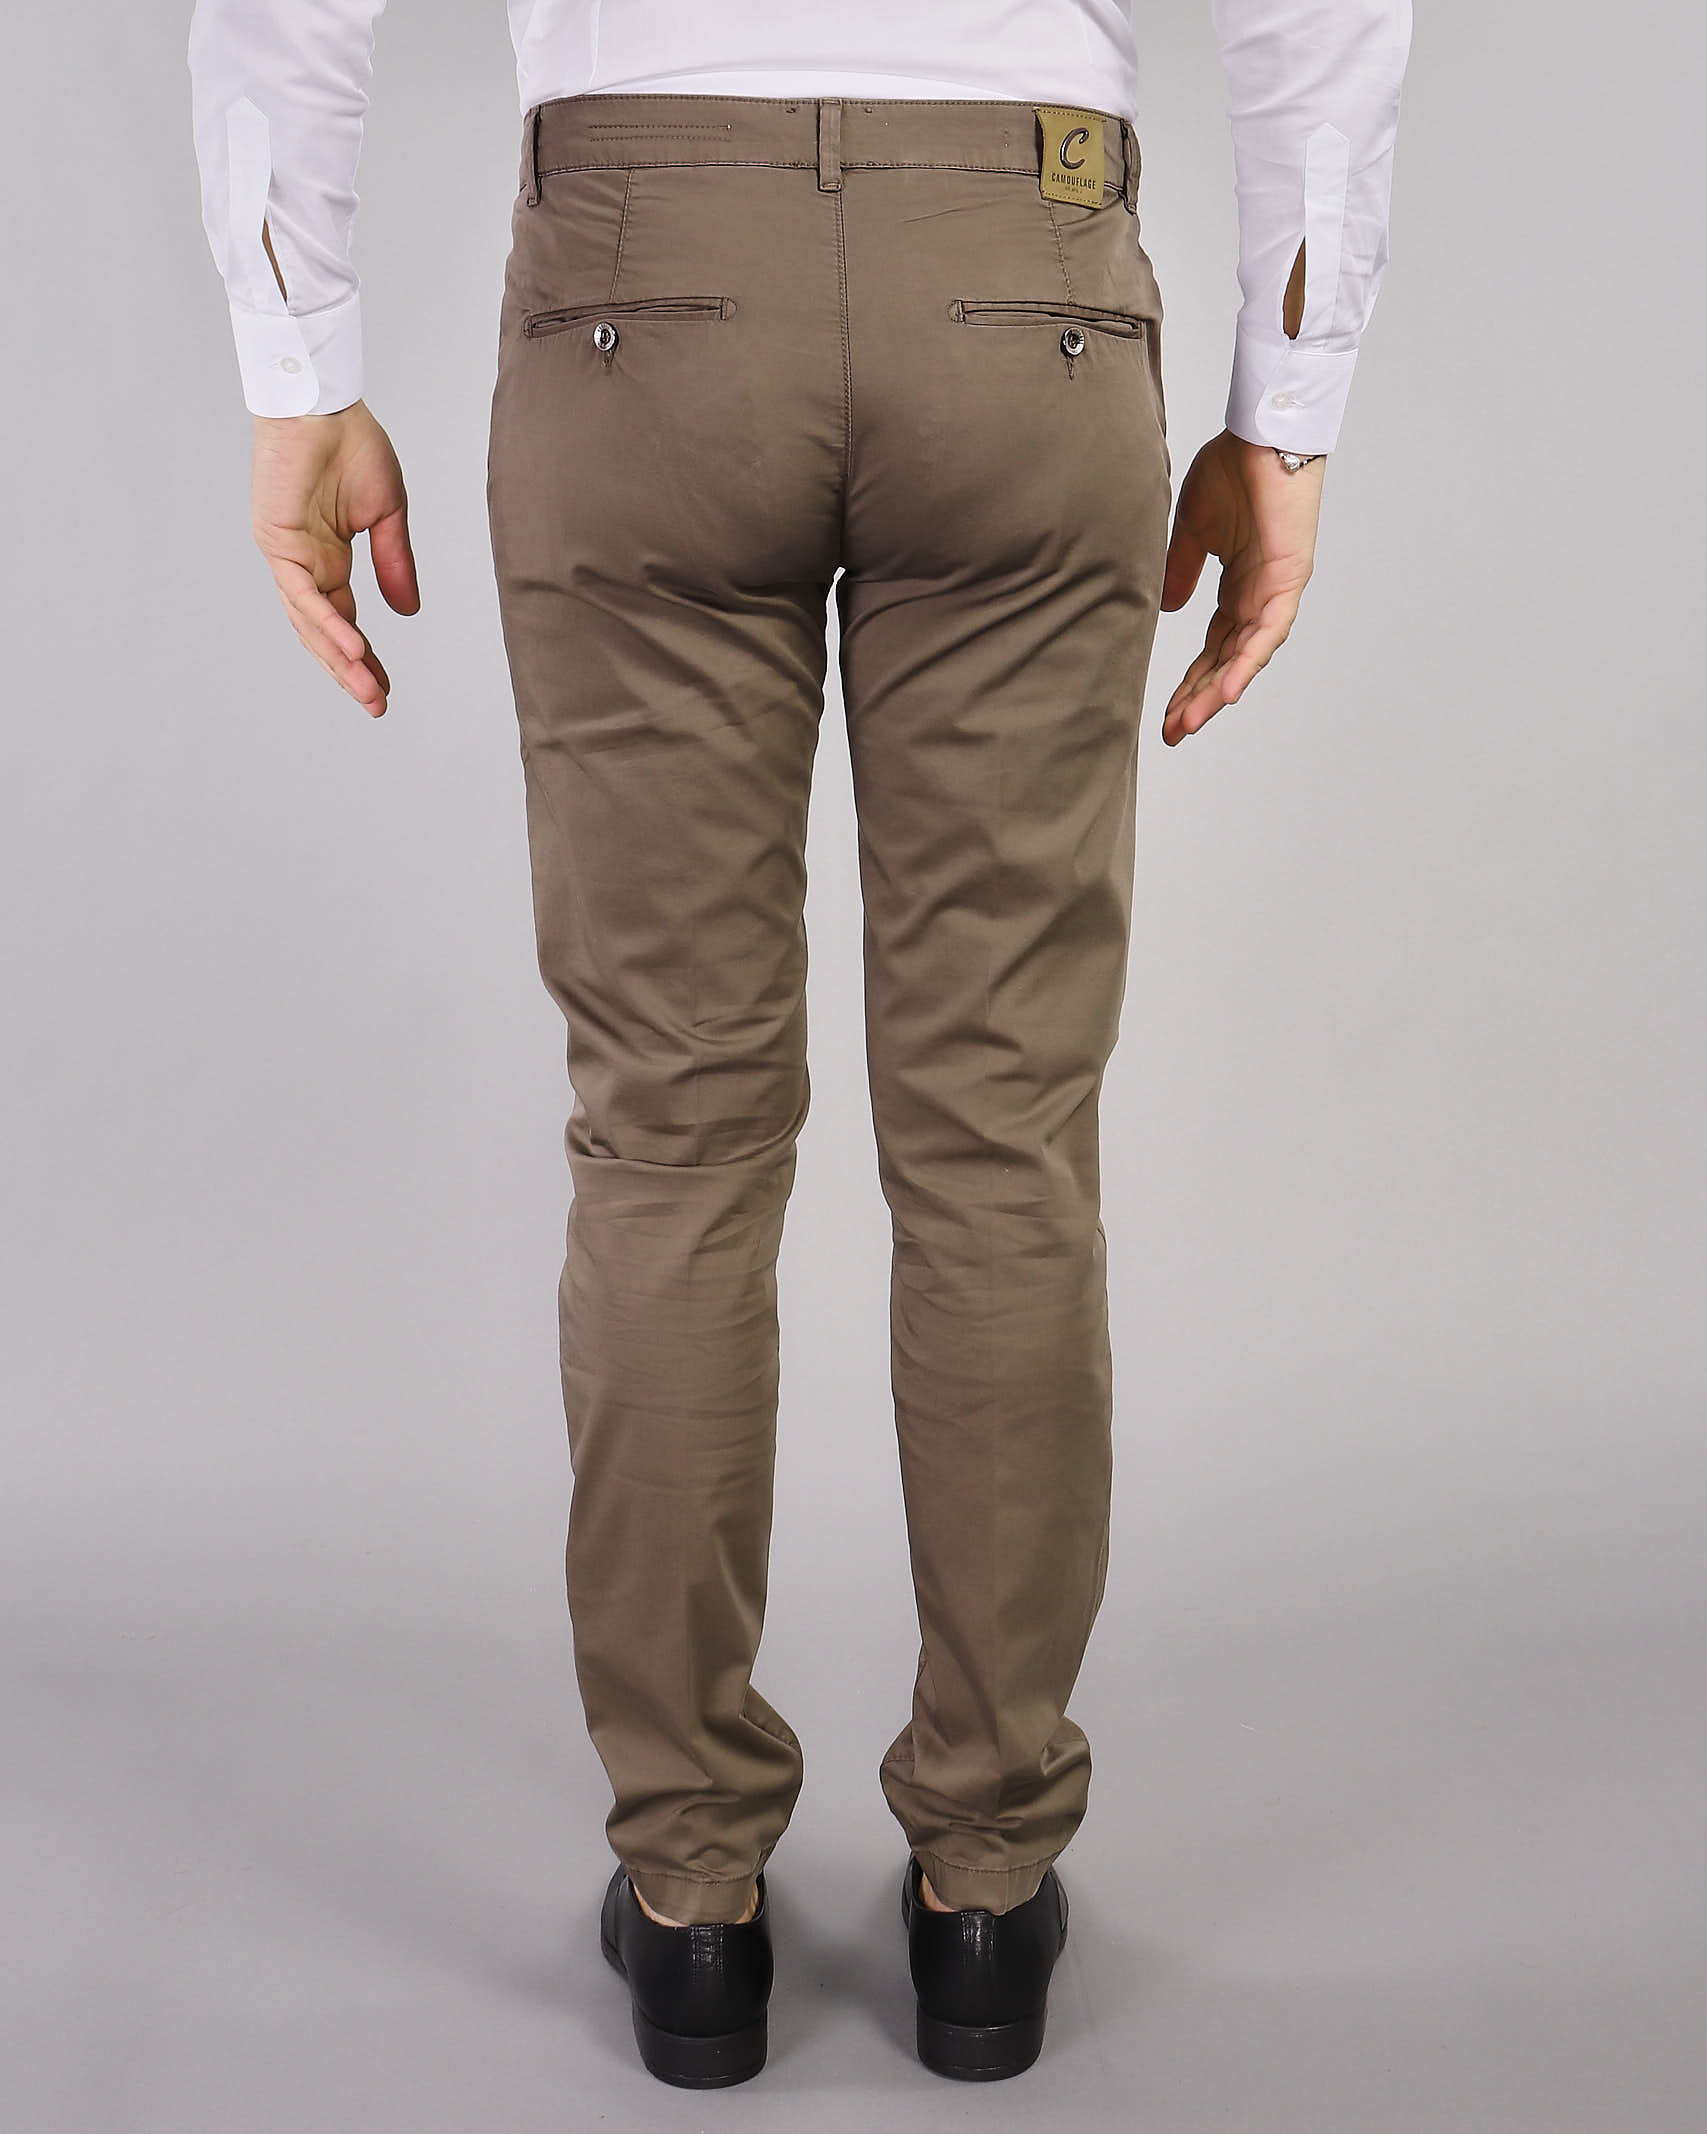 Pantalone tasca america in cotone Camouflage CAMOUFLAGE   Pantalone   CHINOSREY781